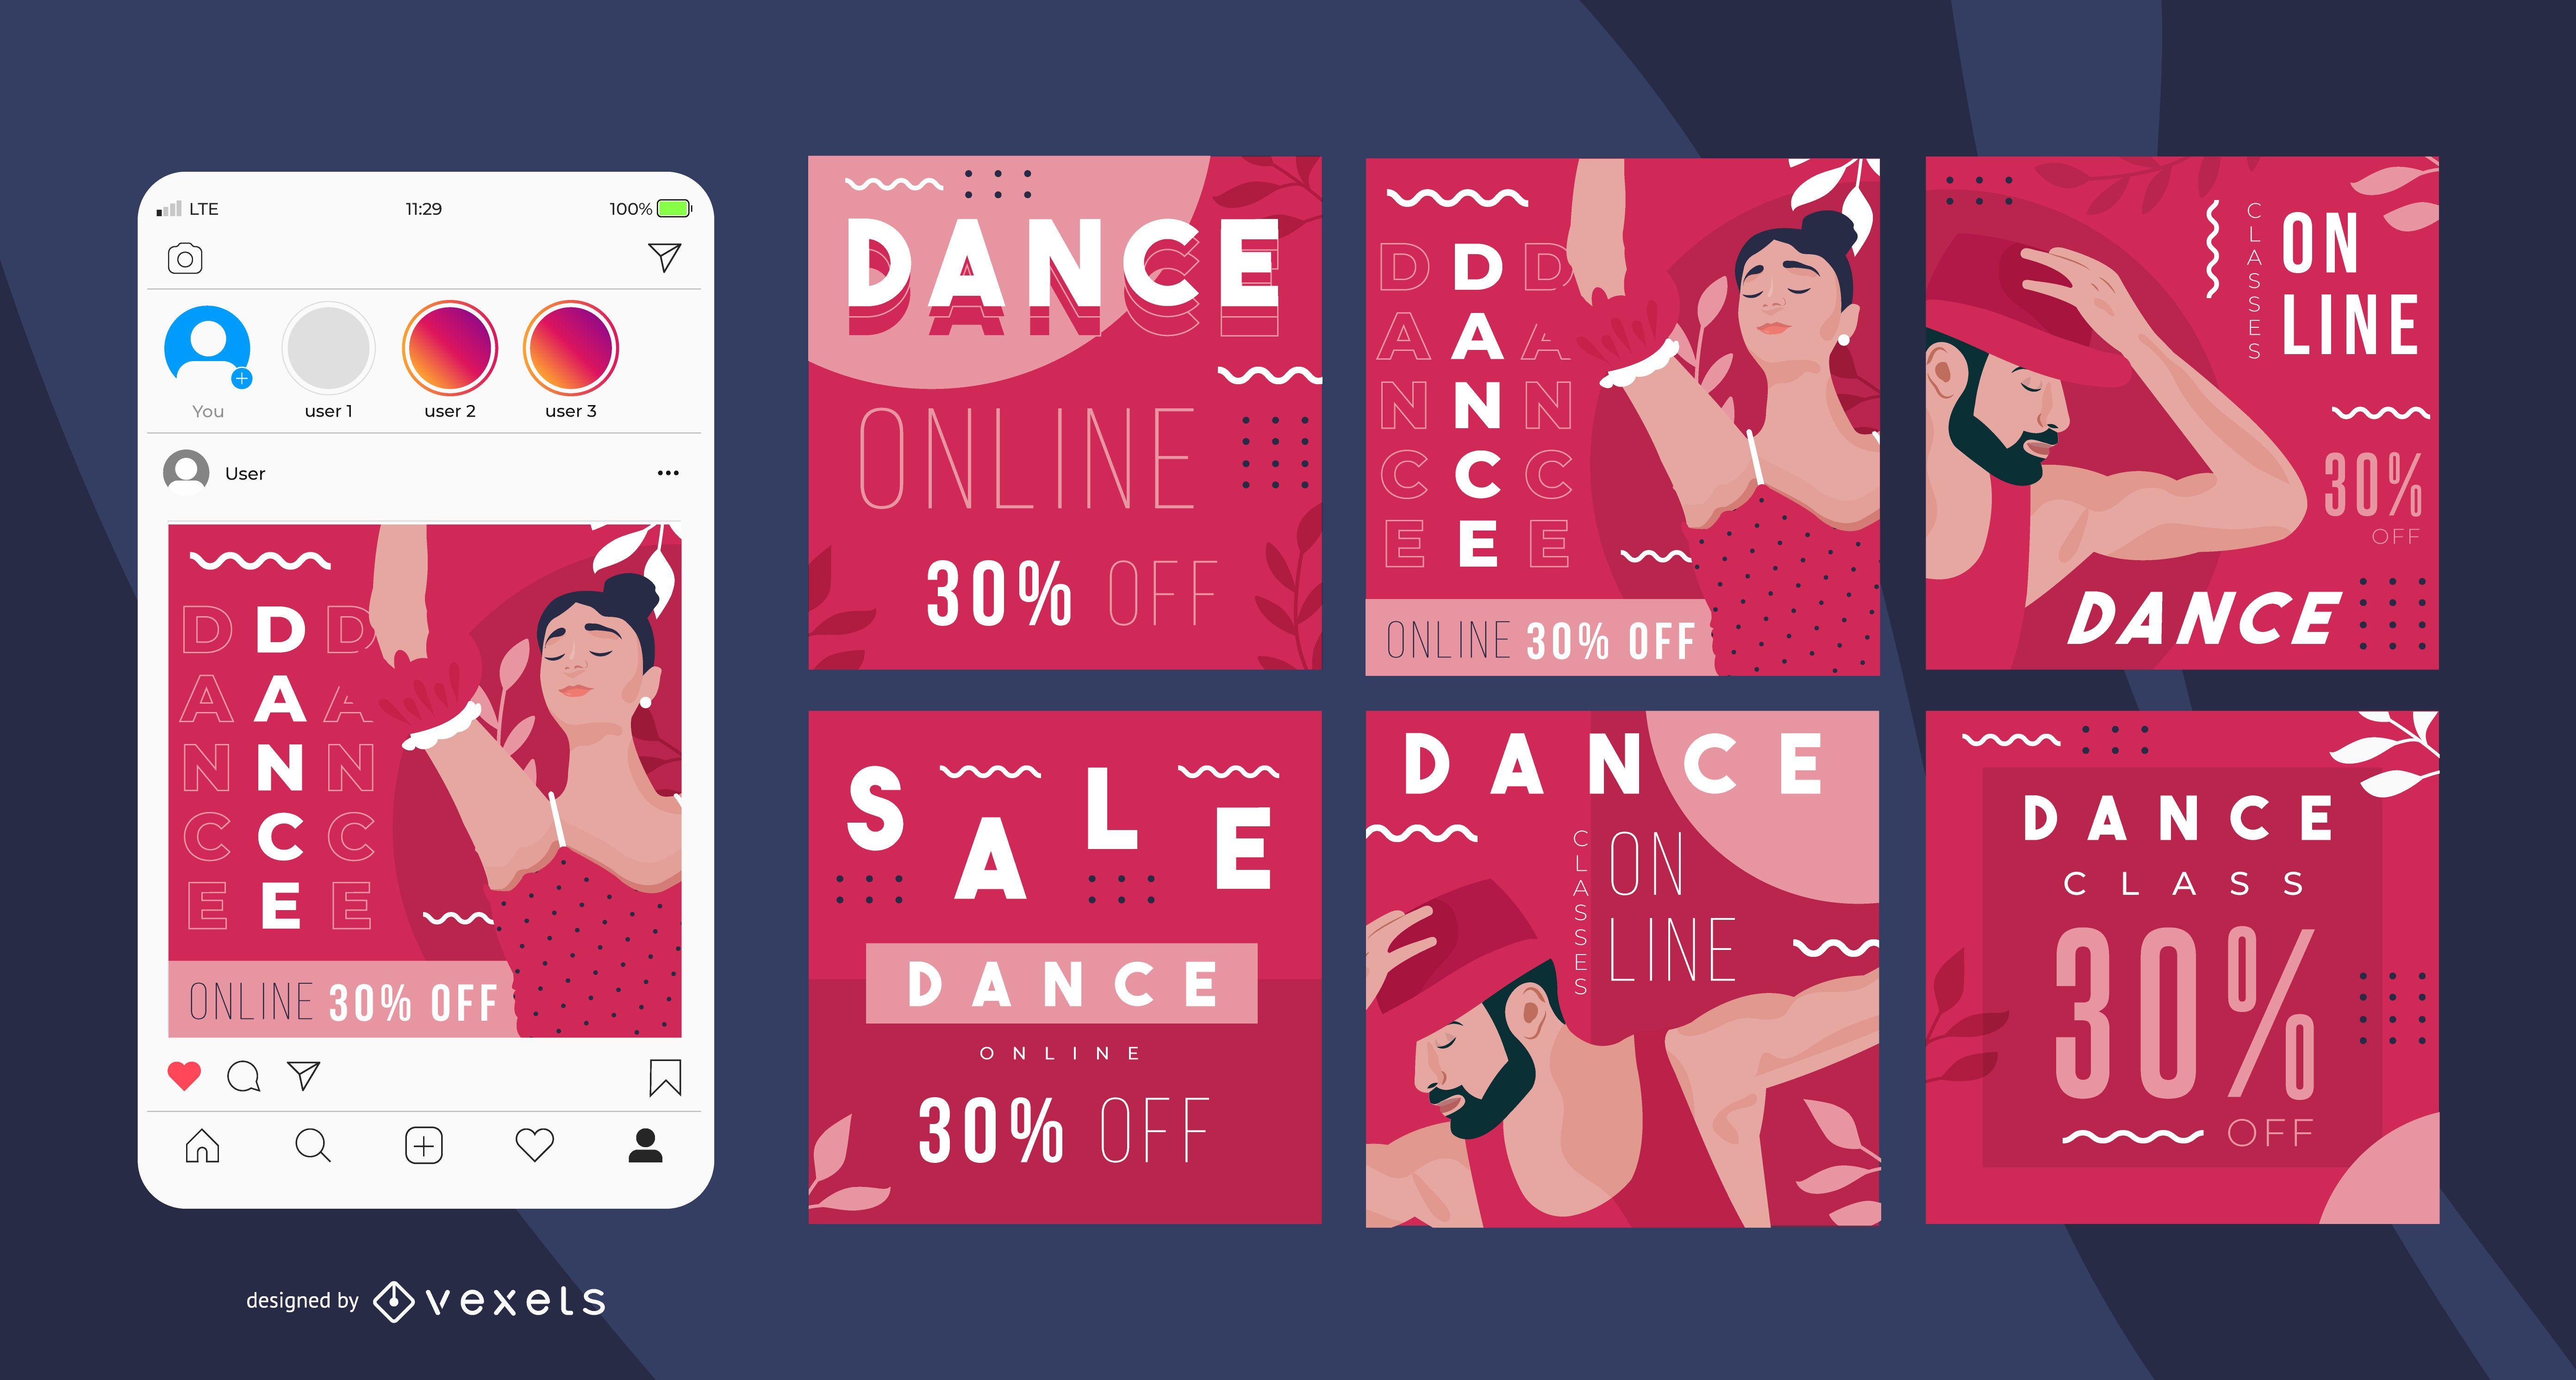 Dance online social media posts